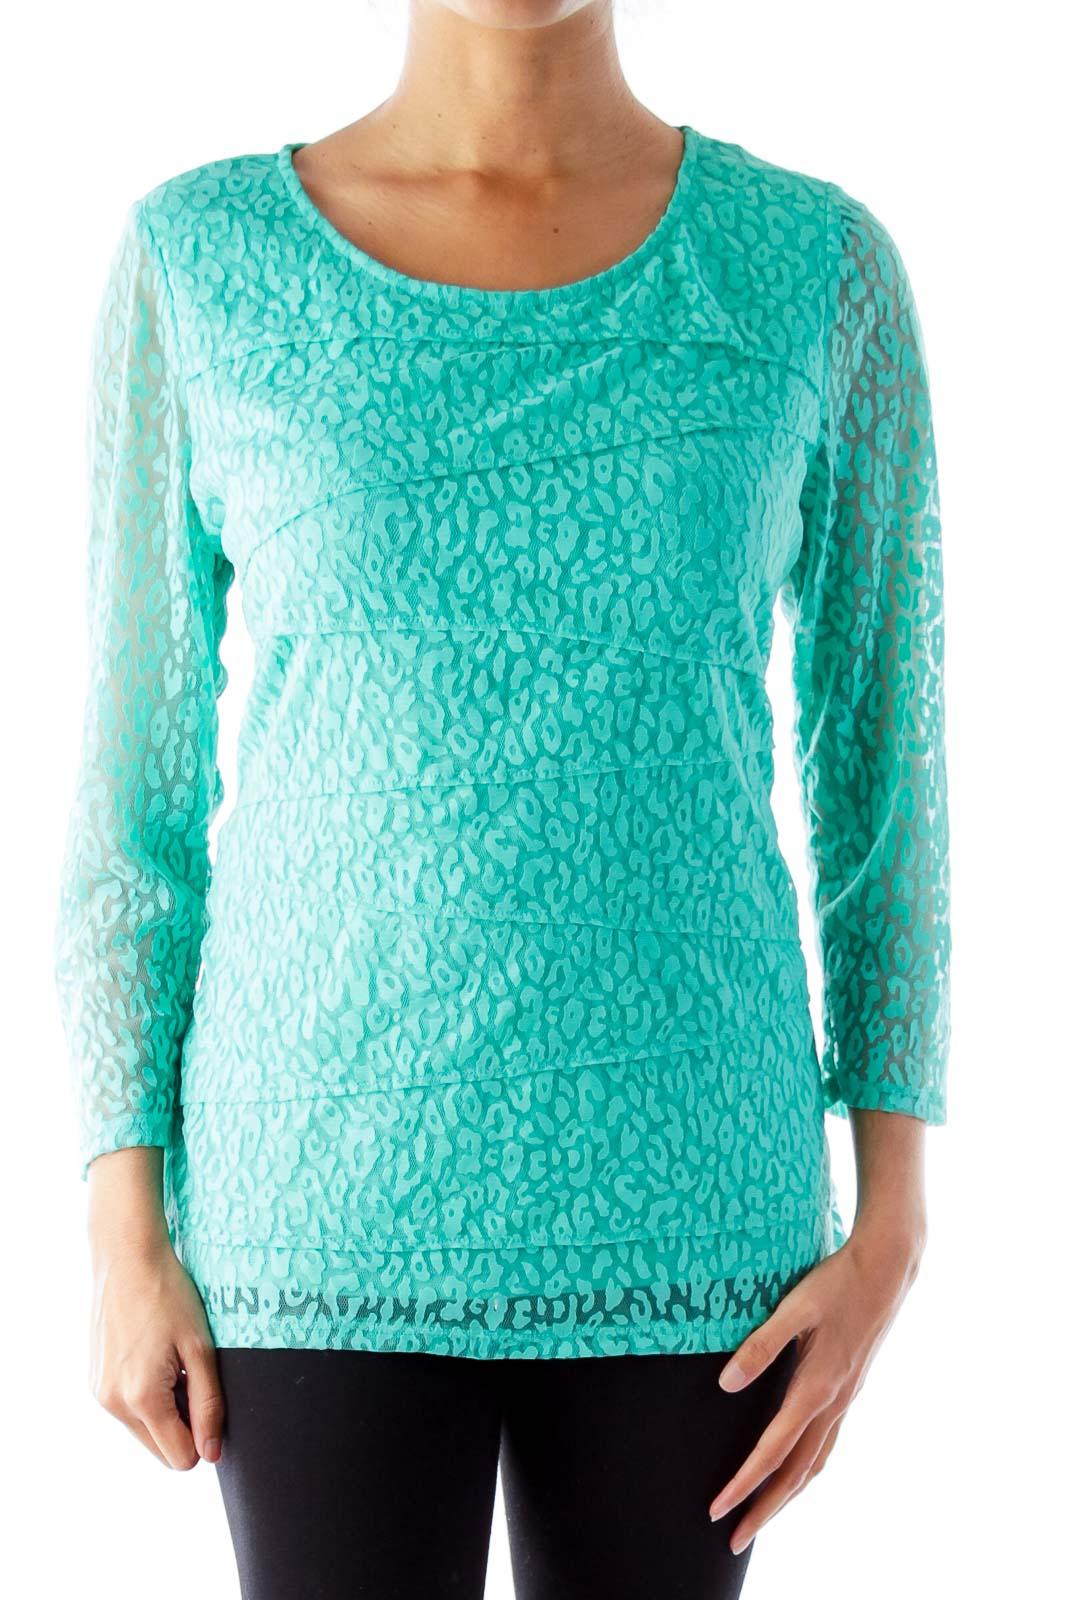 Green Animal Print Lace Shirt